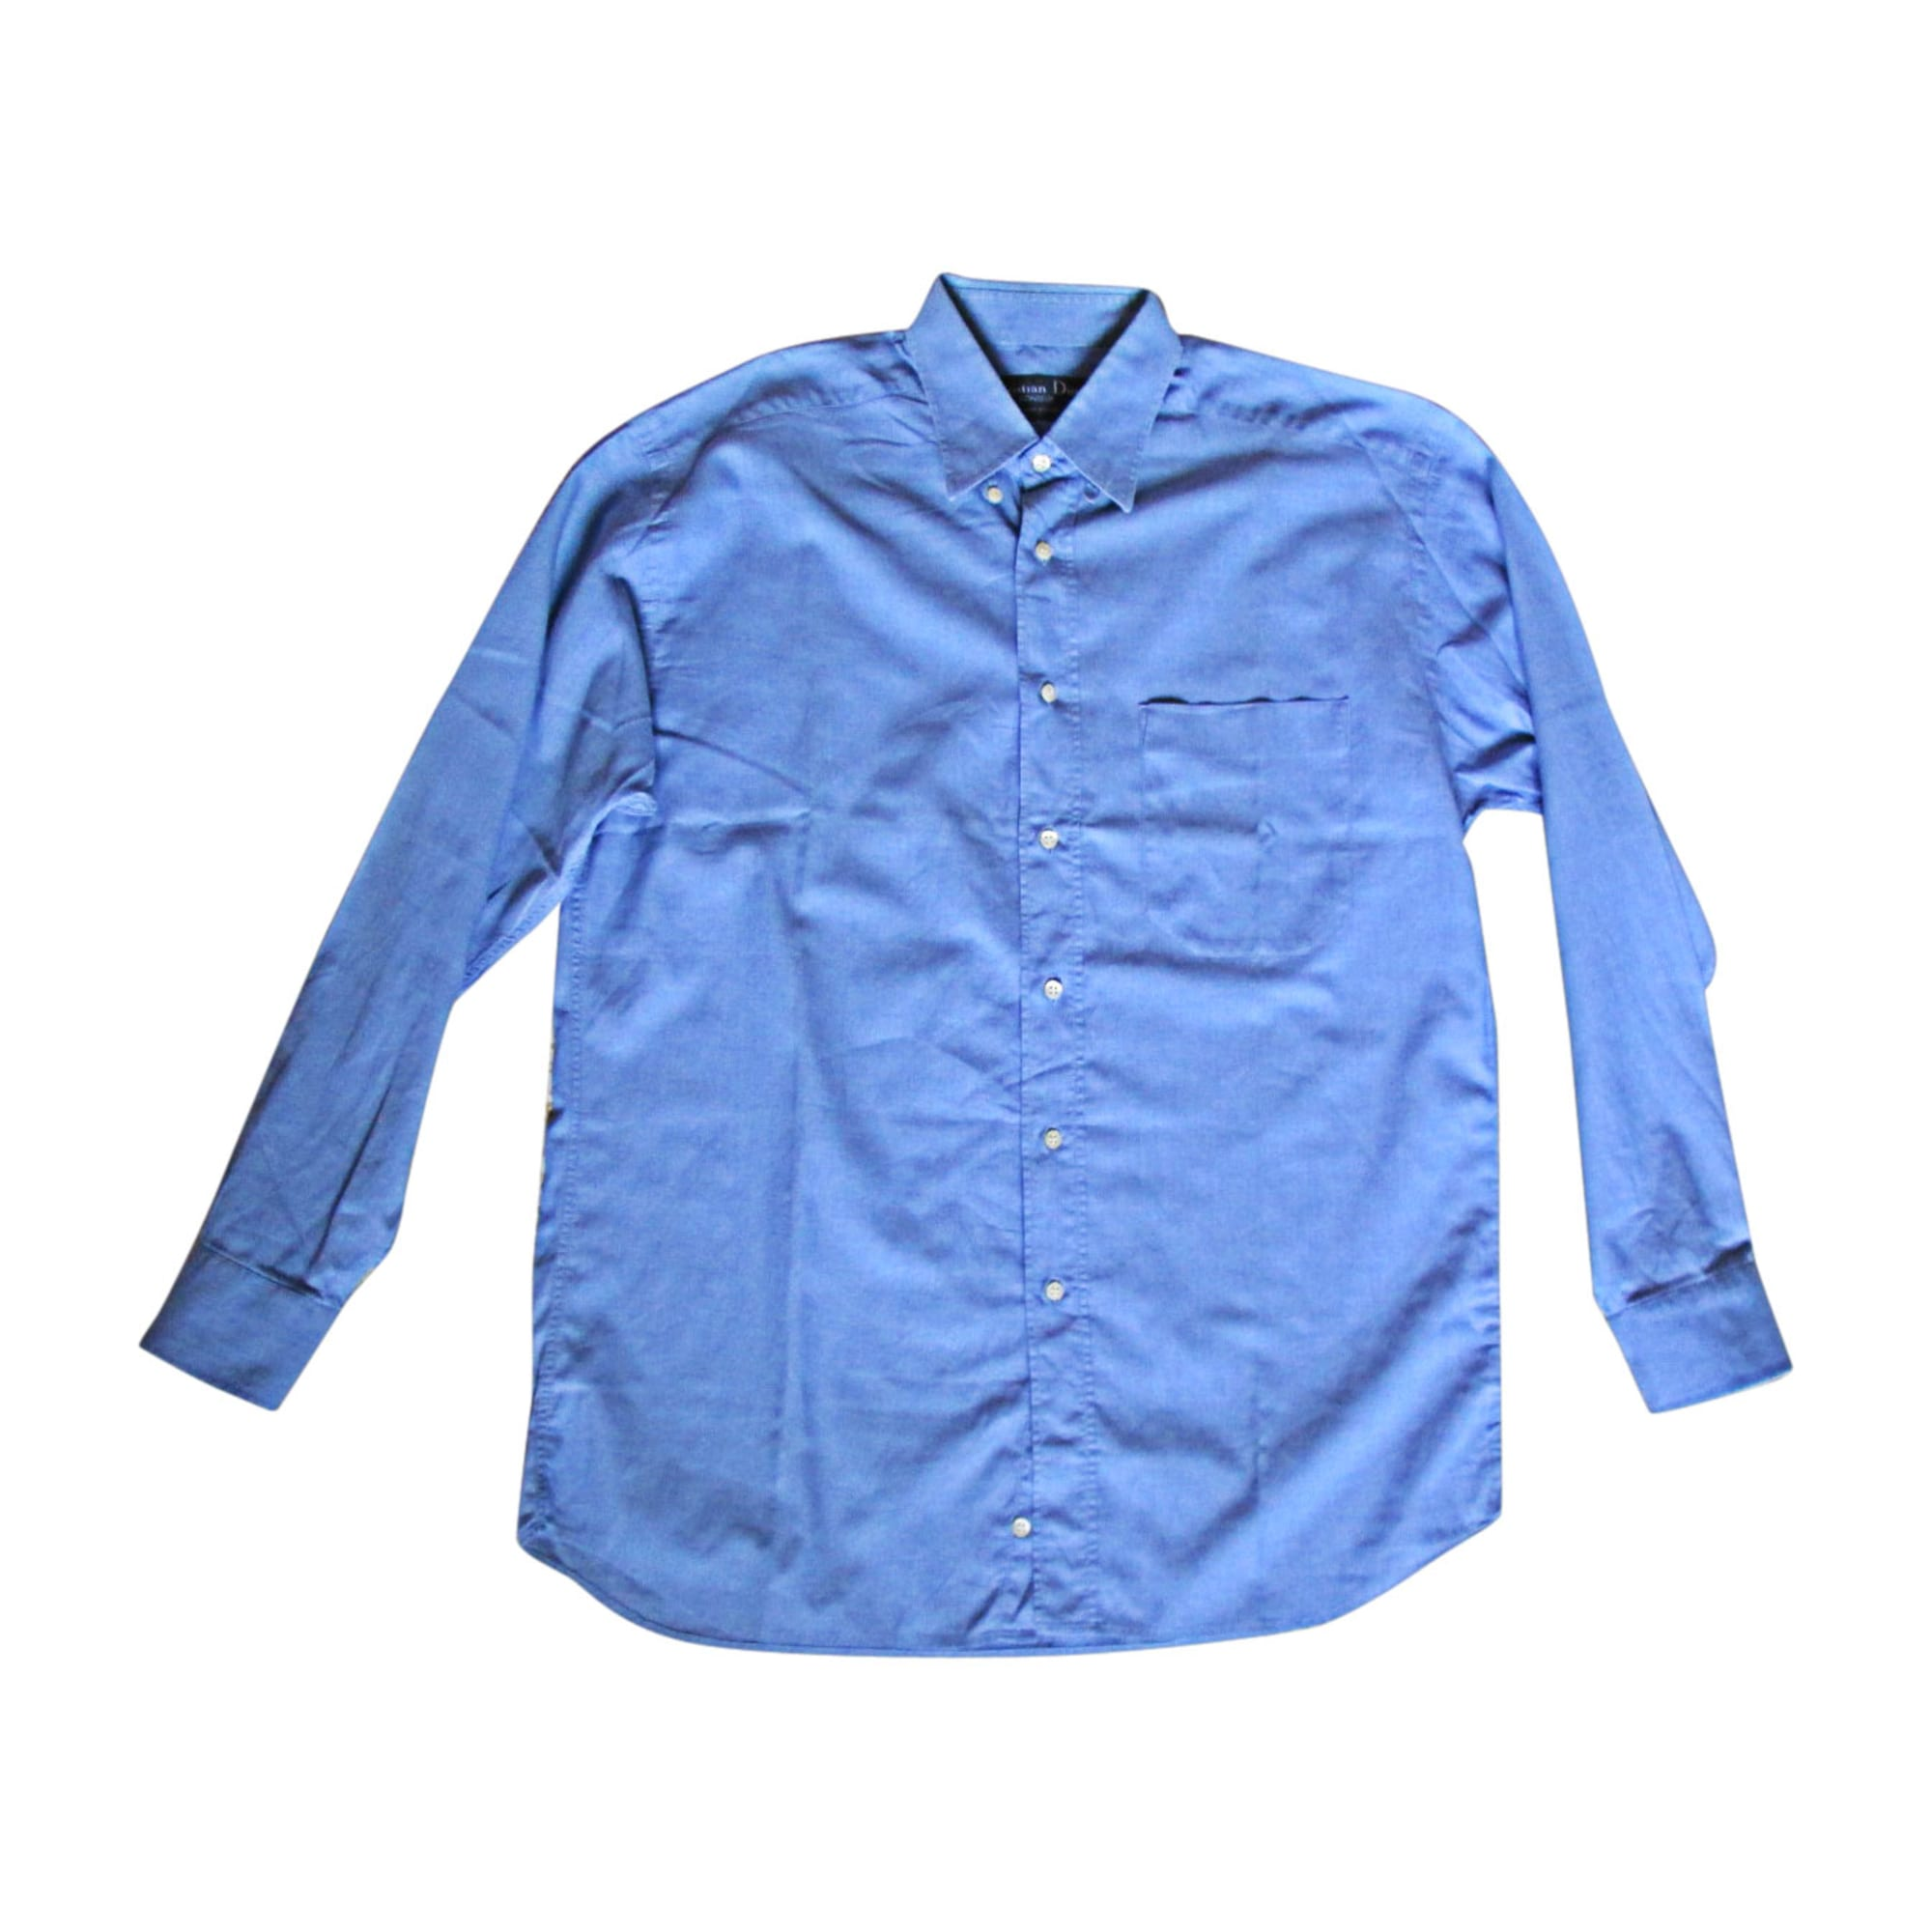 Chemise DIOR HOMME Bleu, bleu marine, bleu turquoise ac28173f08e